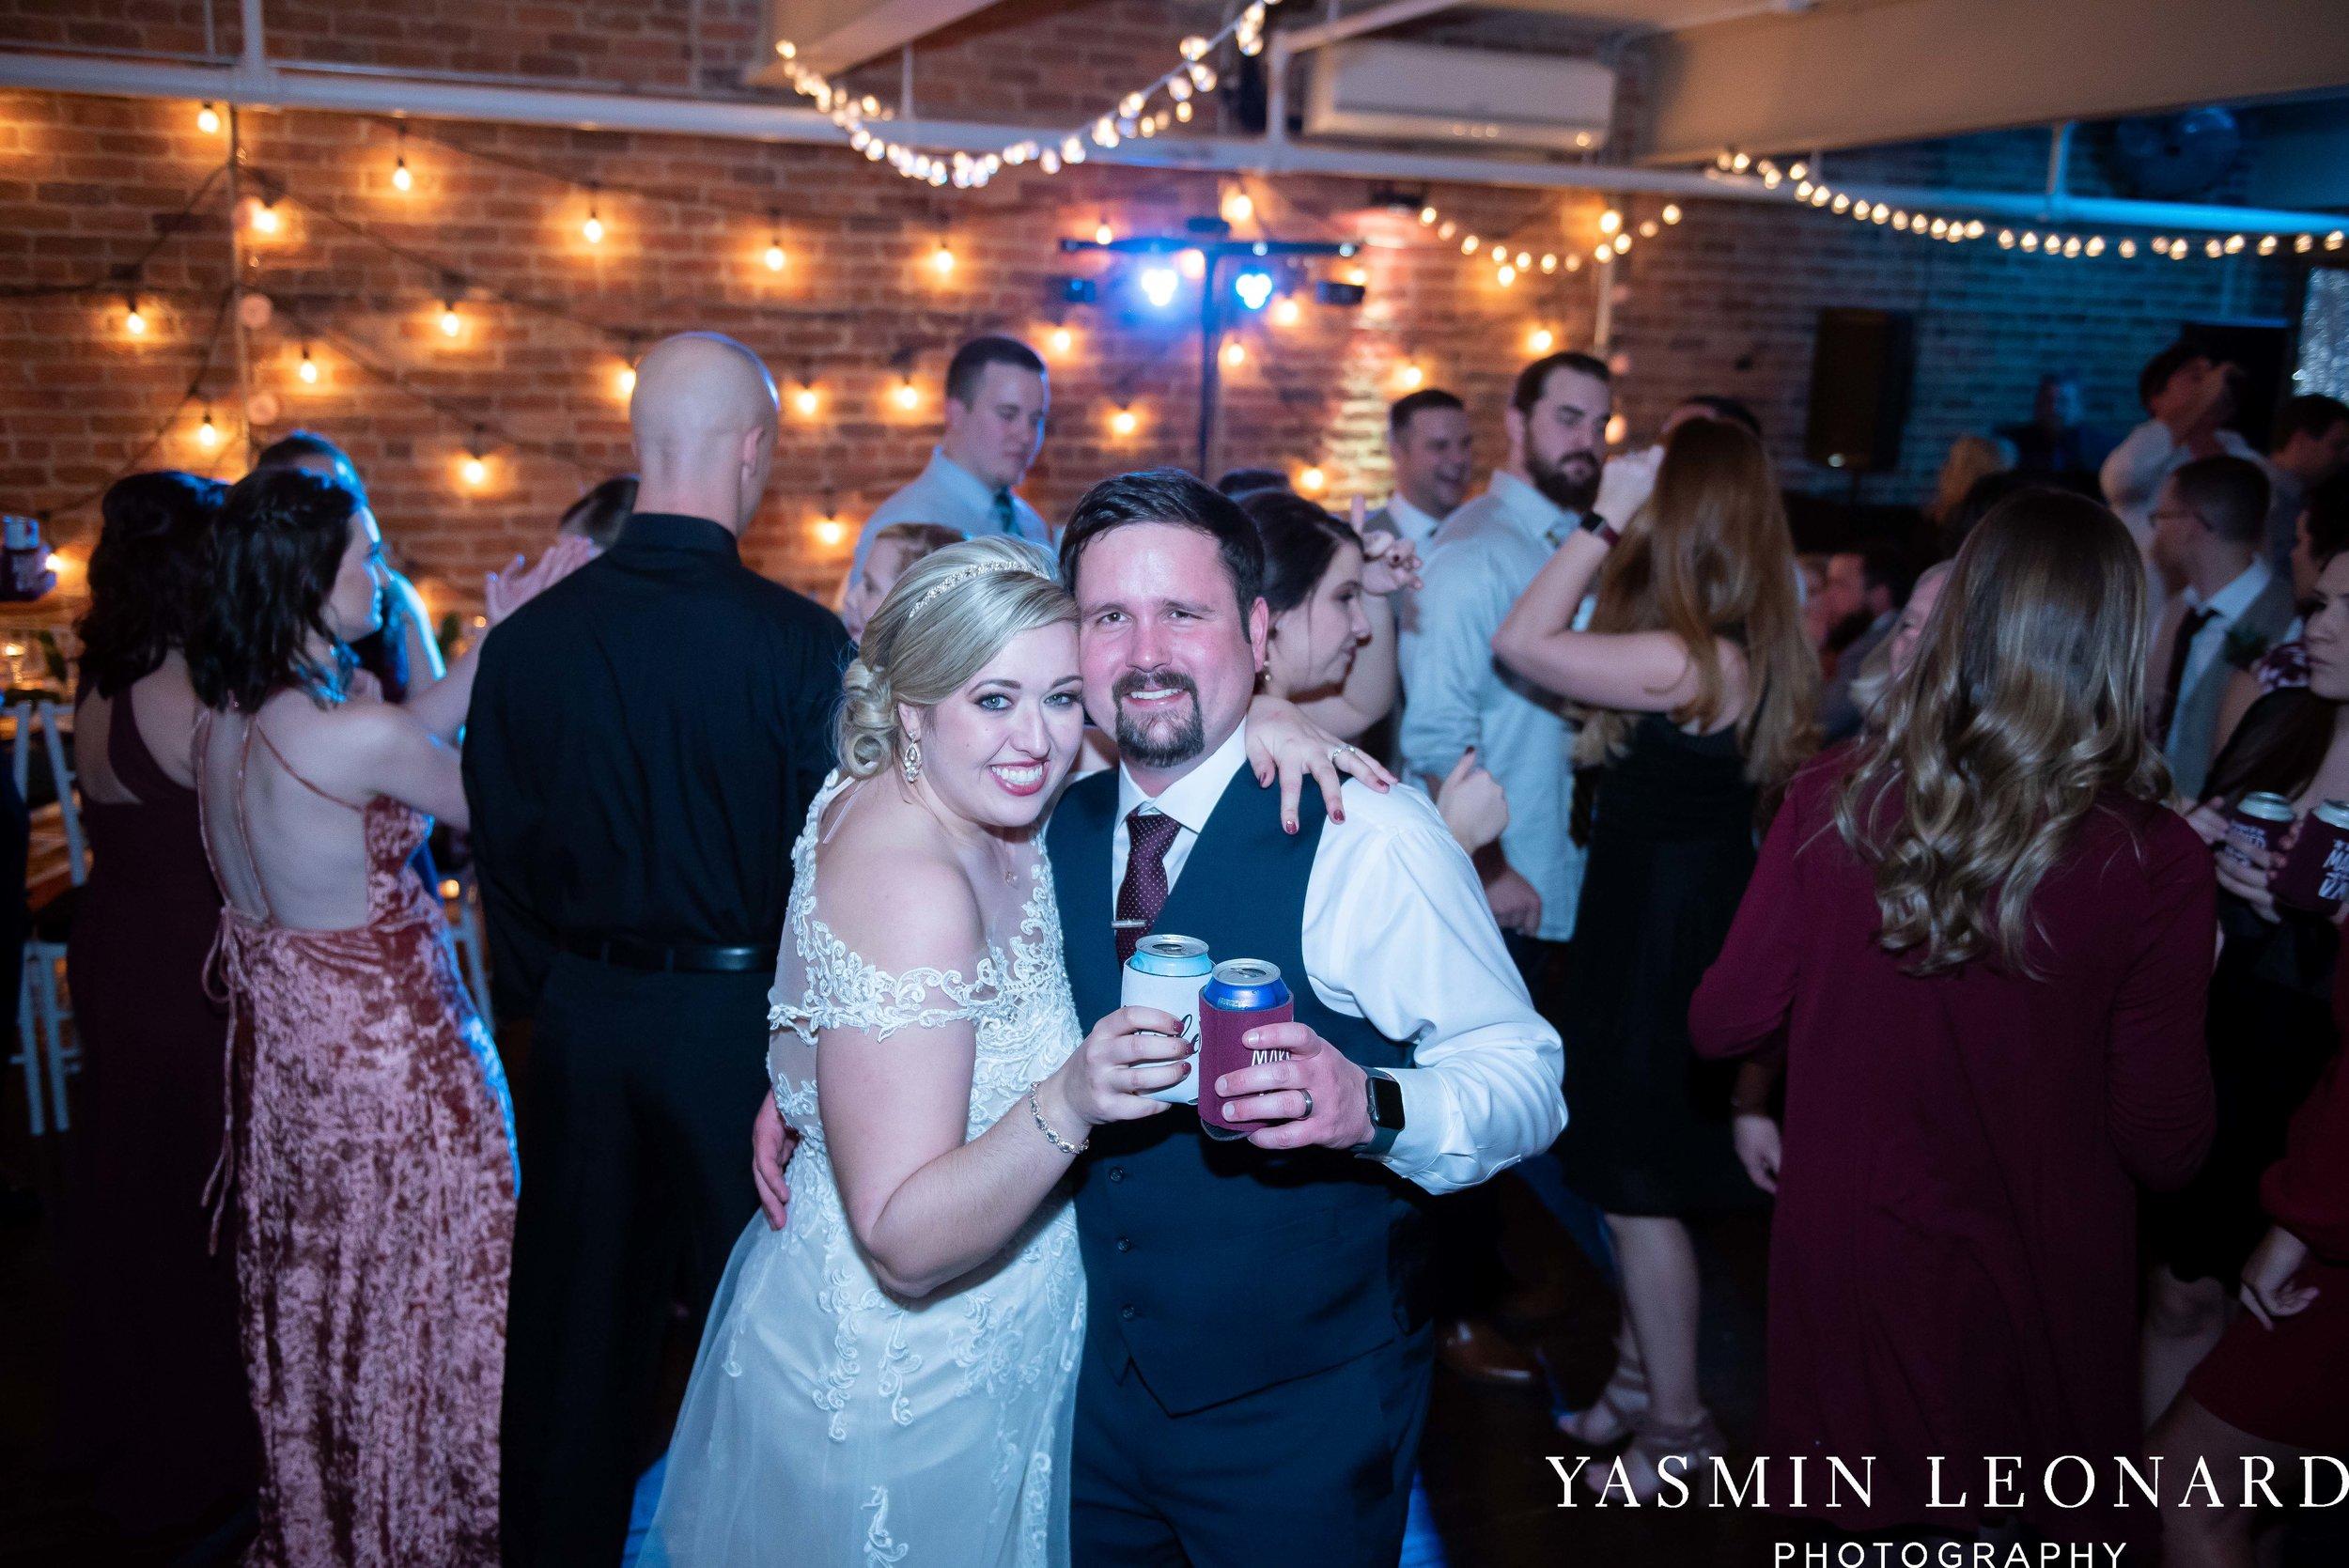 Rebekah and Matt - 105 Worth Event Centre - Yasmin Leonard Photography - Asheboro Wedding - NC Wedding - High Point Weddings - Triad Weddings - Winter Wedding-63.jpg